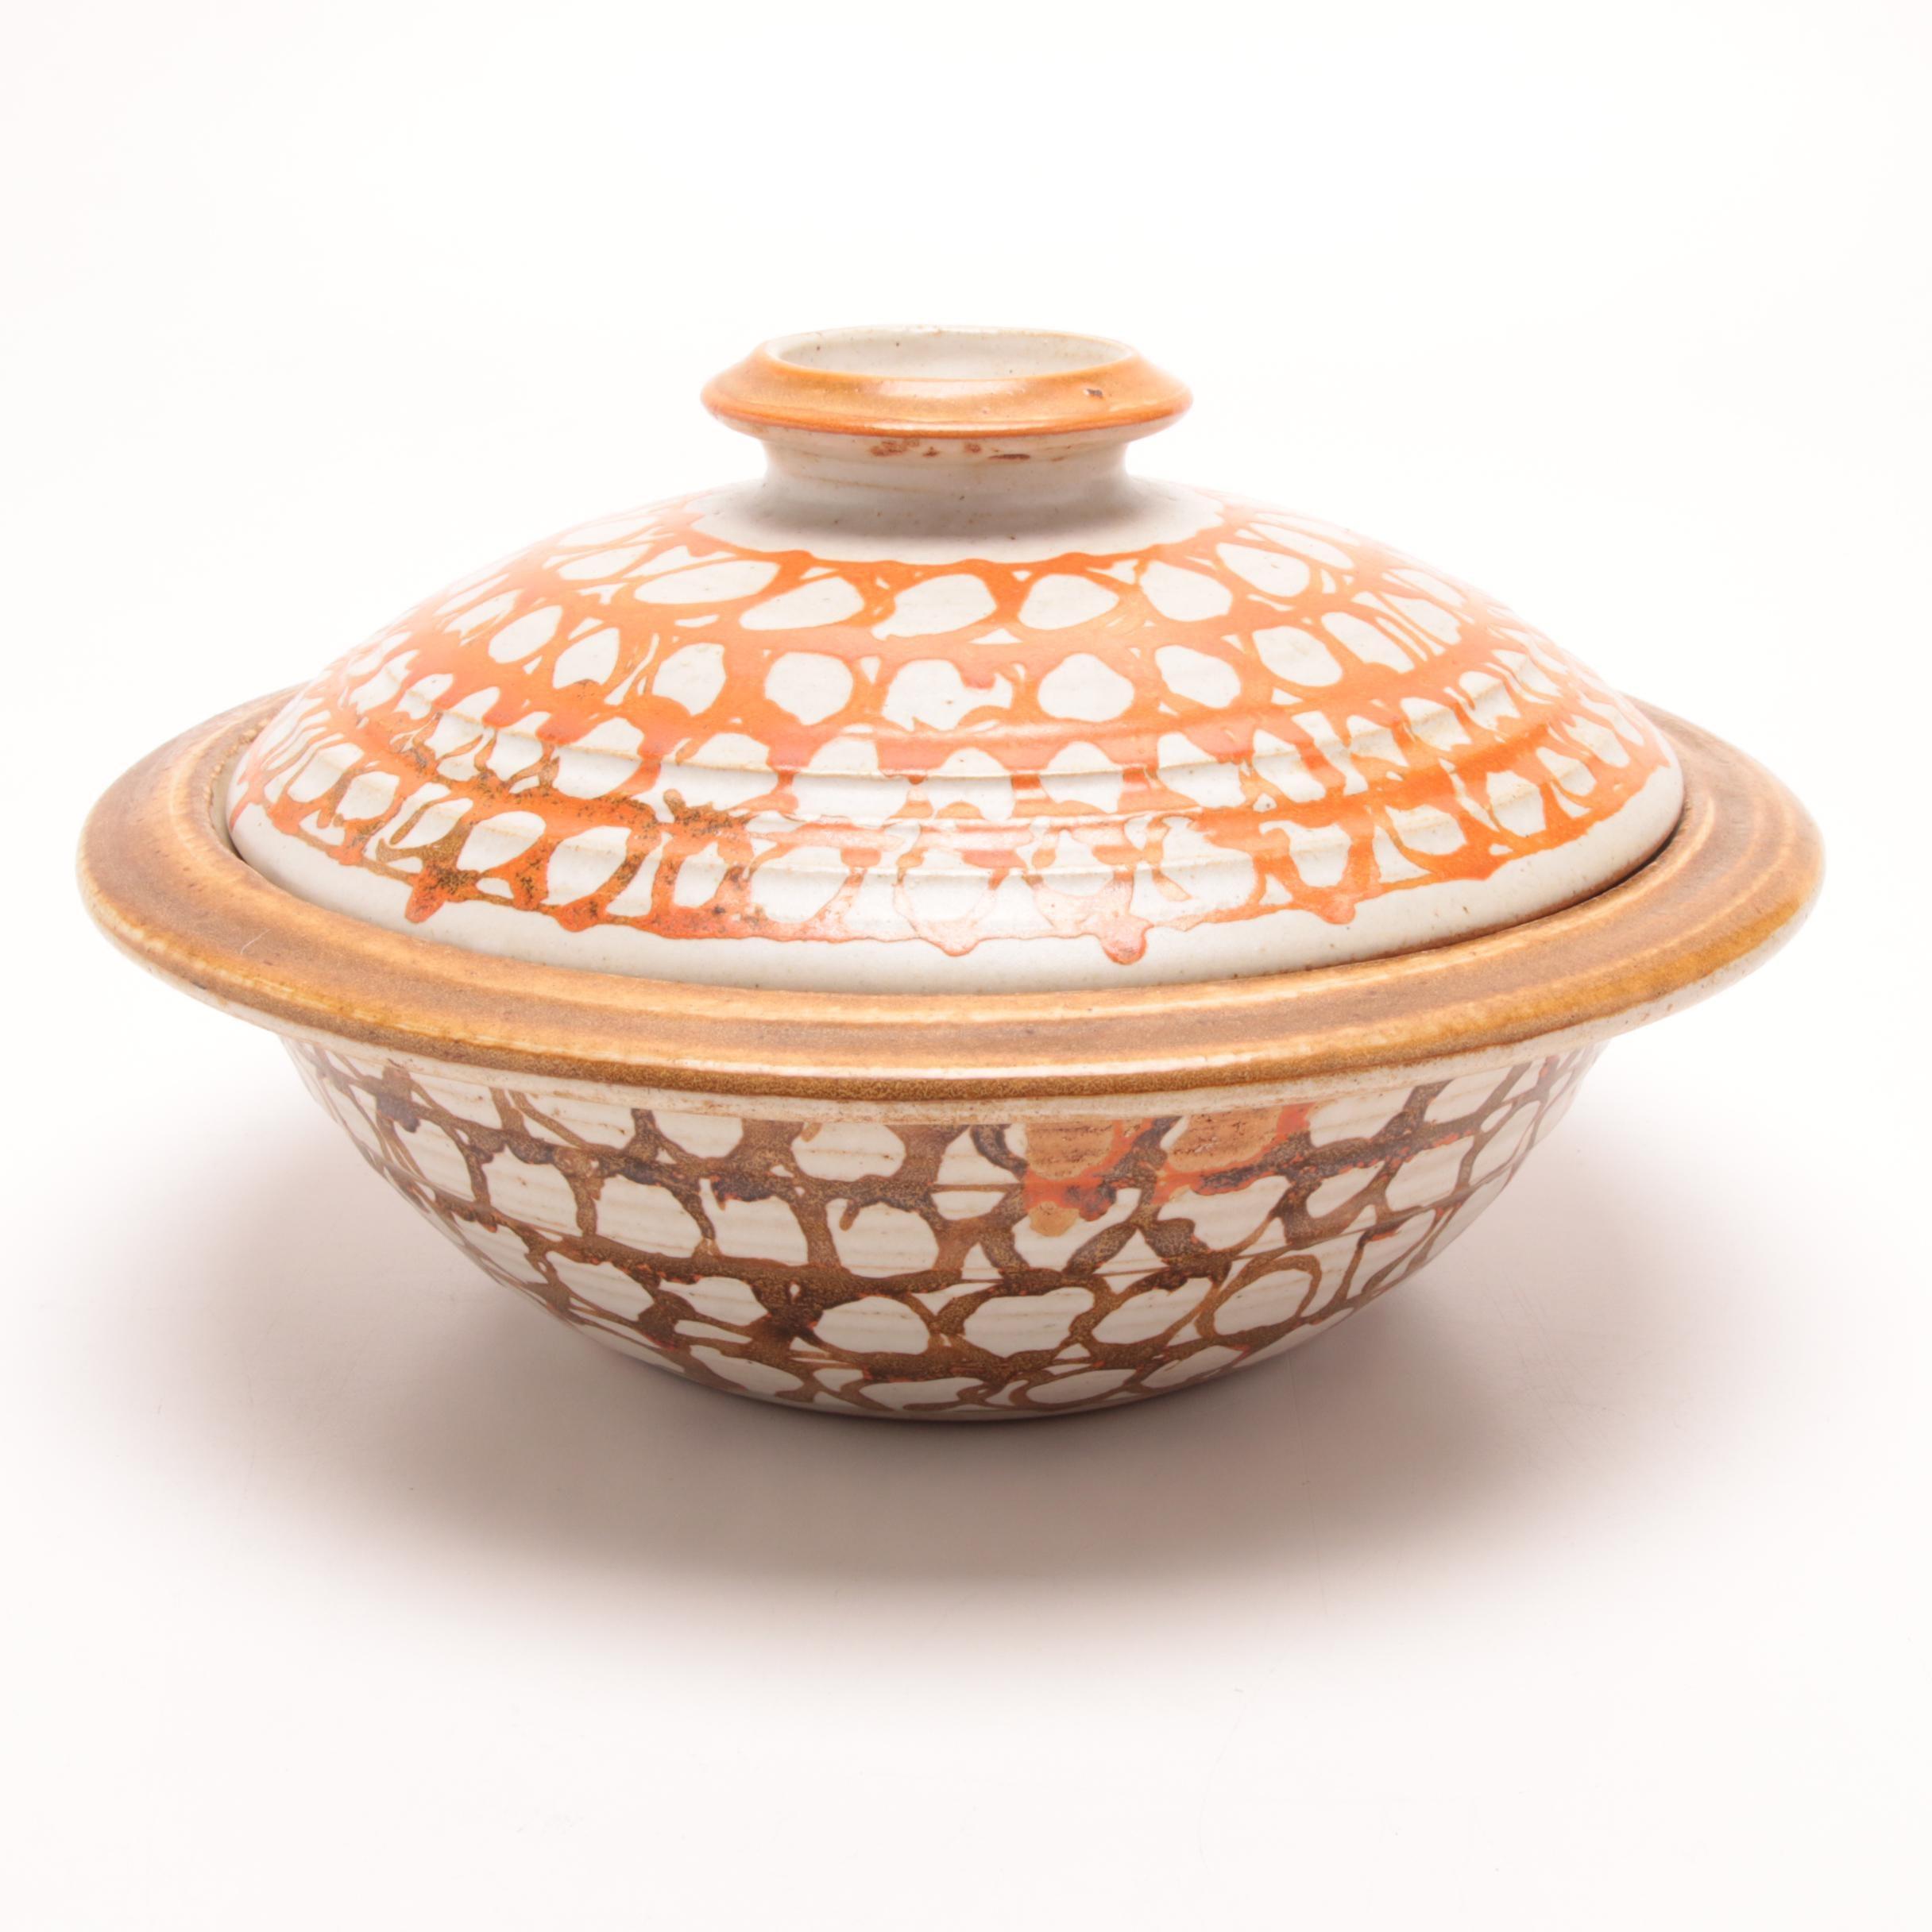 Wheel Thrown Stoneware Covered Bowl